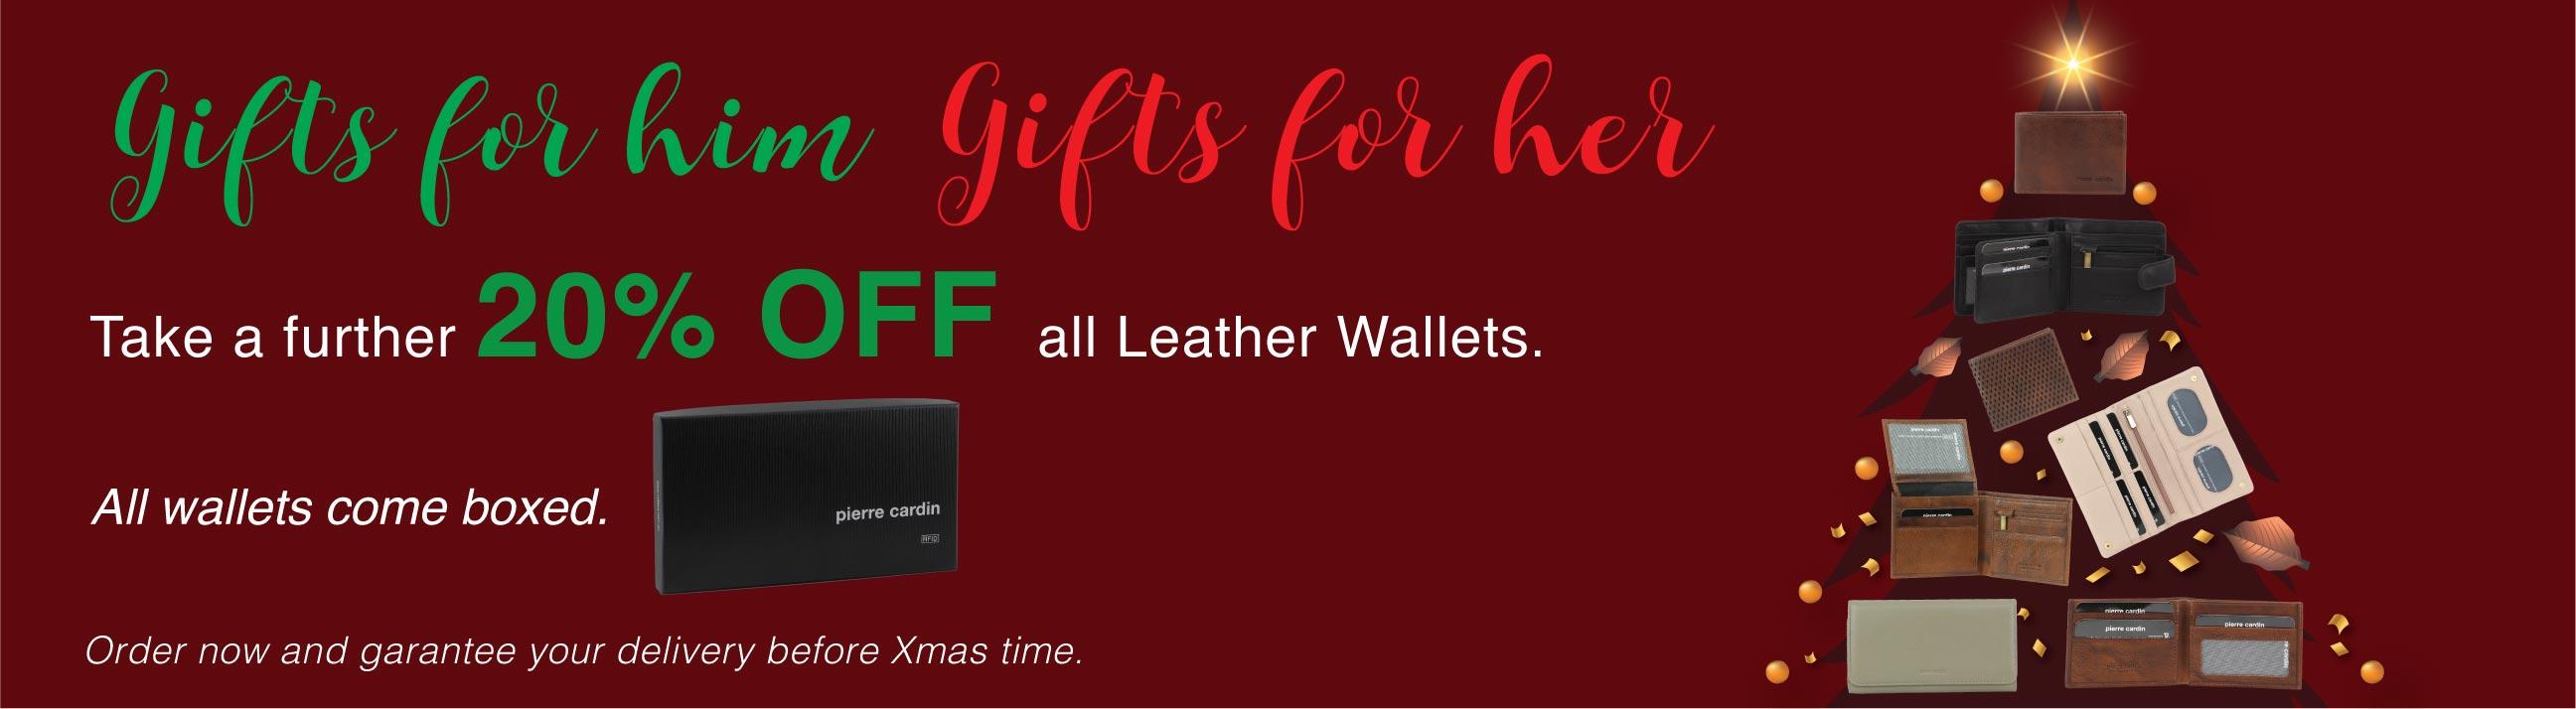 xmas-gifts-promo-banner-02.jpg